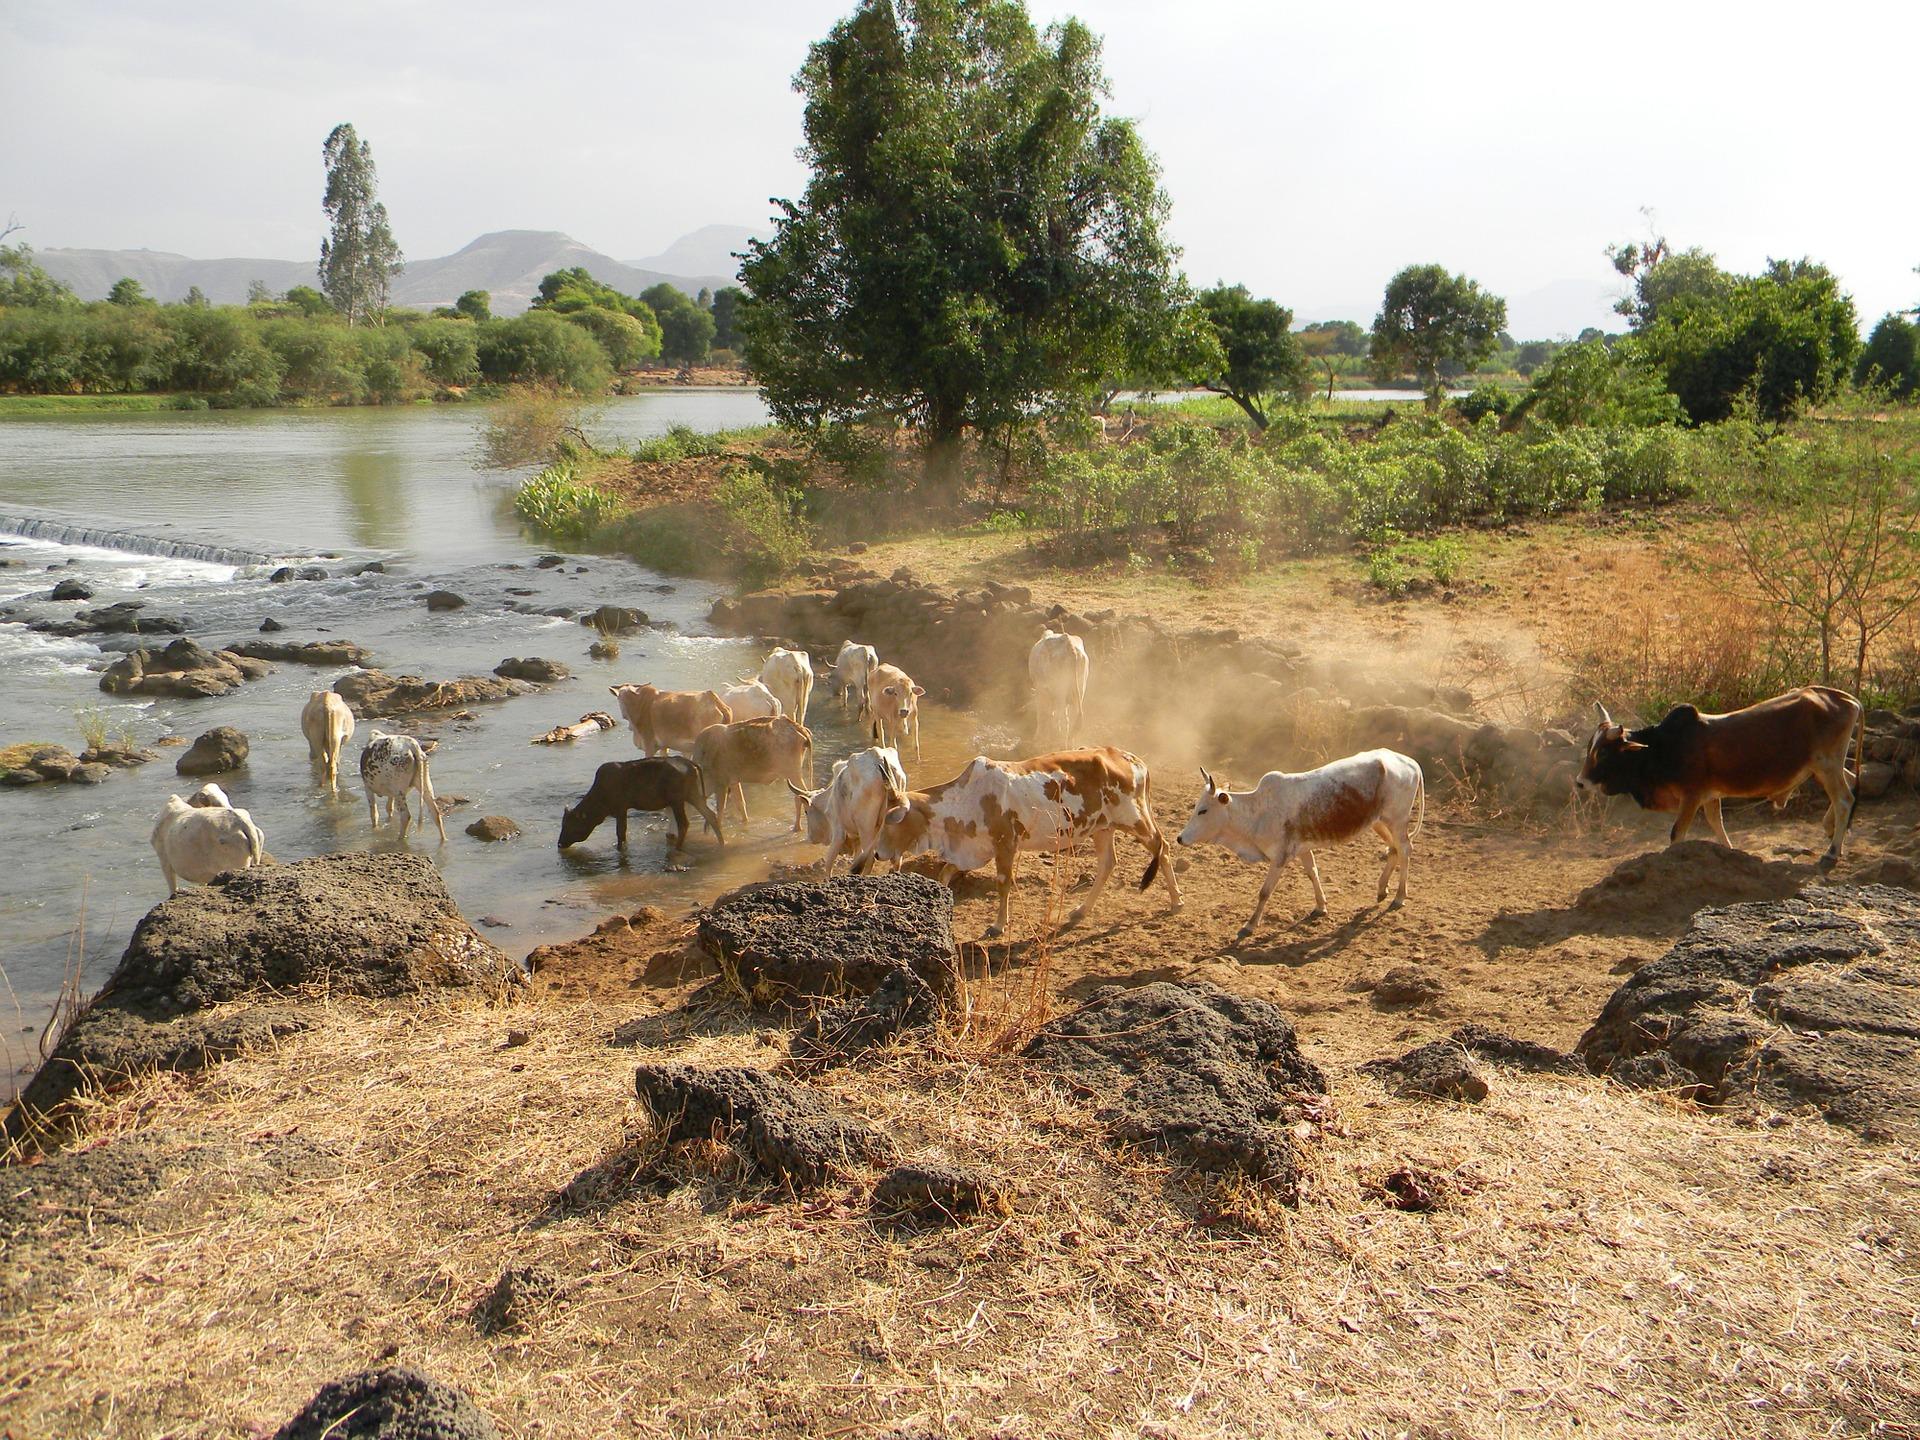 Tsis Isat, chutes du Nil